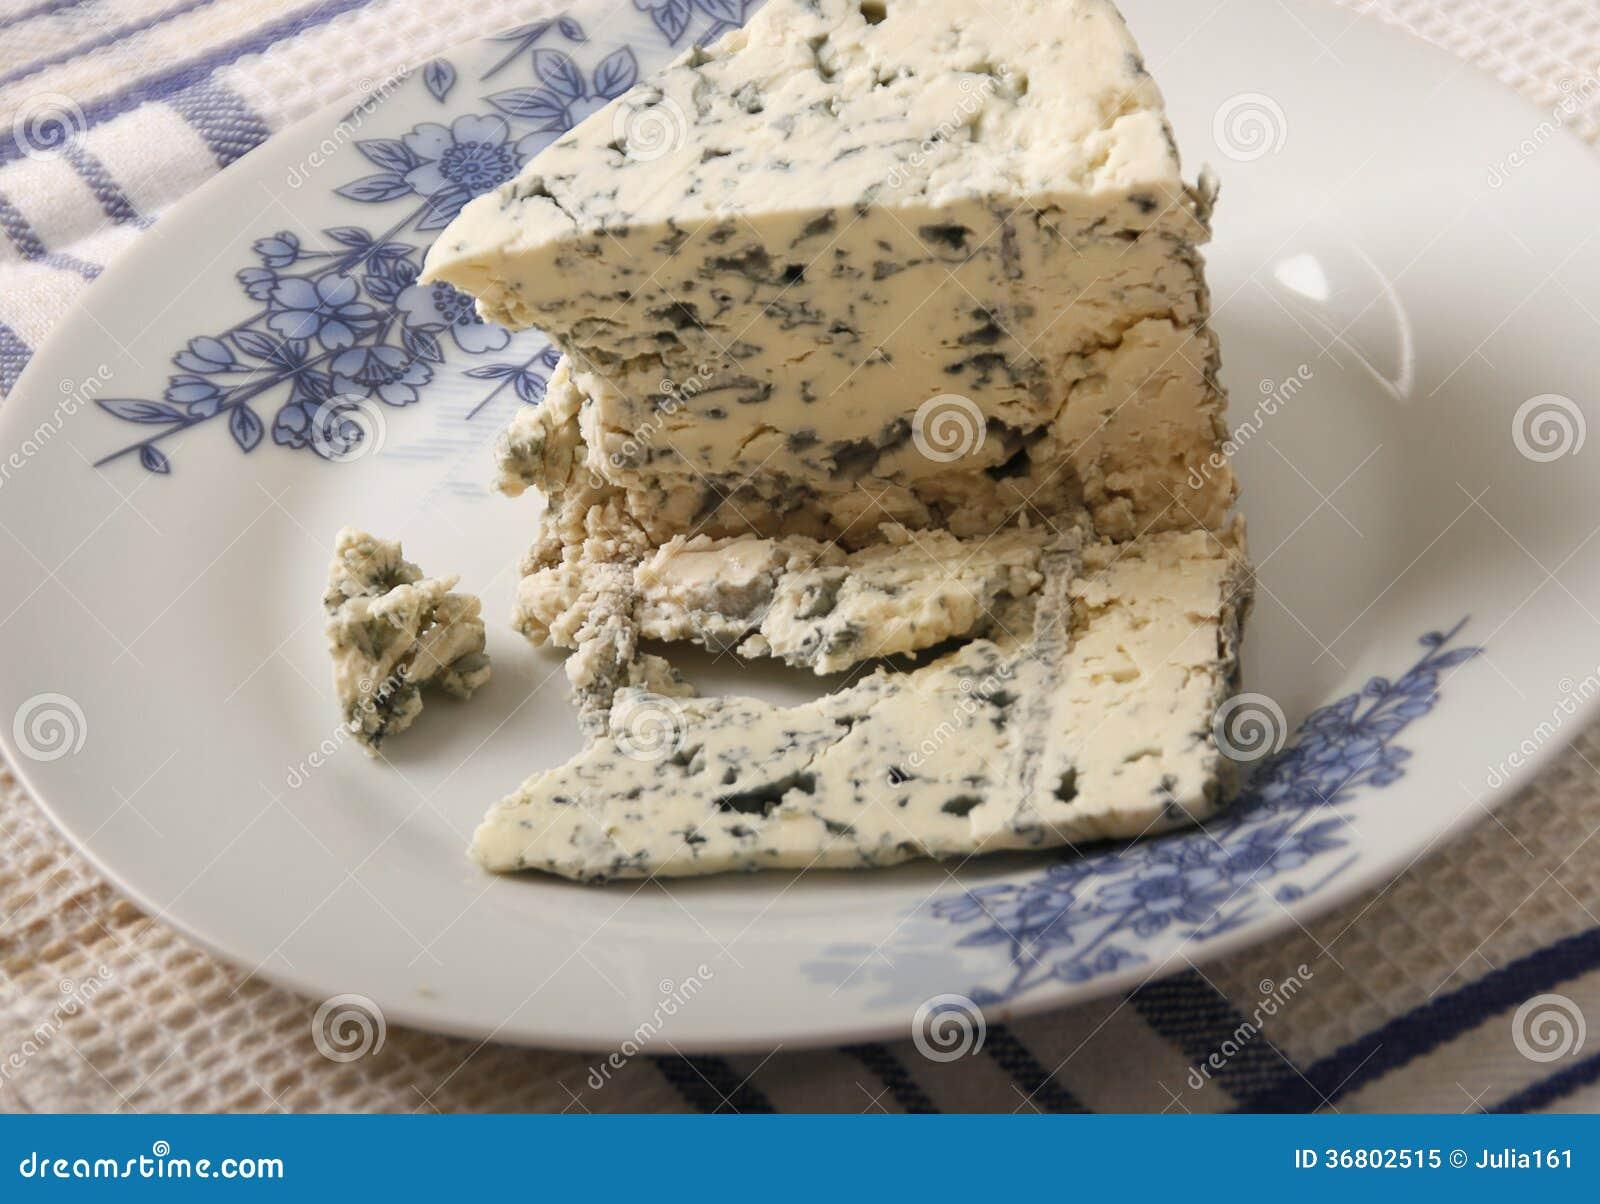 french blue cheese stock image image of gorgonzola snack 36802515